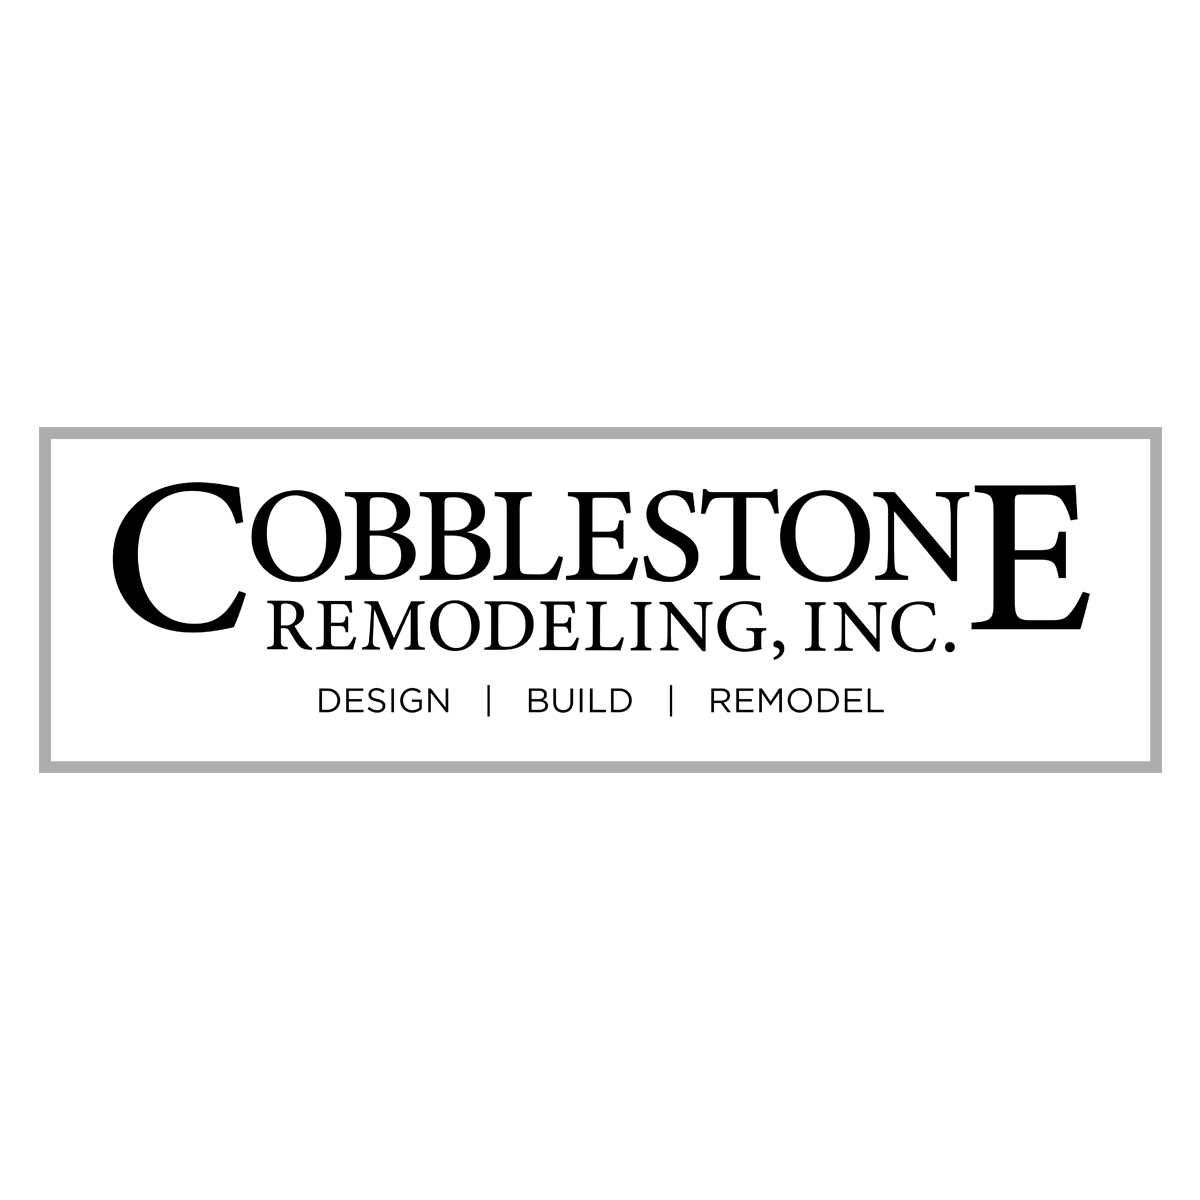 Cobblestone Remodeling Inc